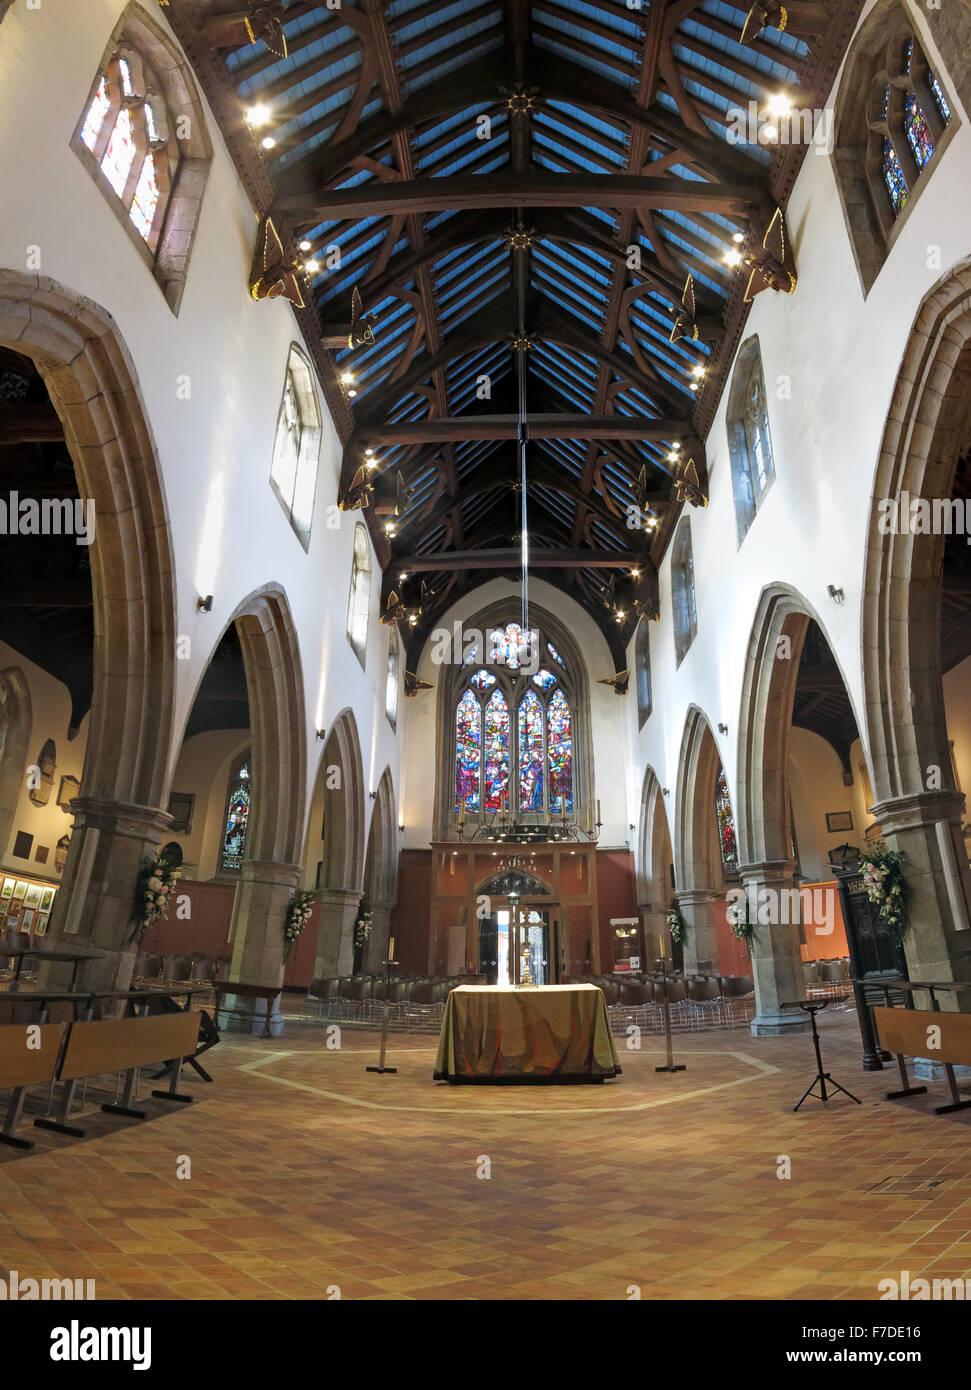 All Saints Church interior, Kingston Upon Thames,London,England,UK - Stock Image